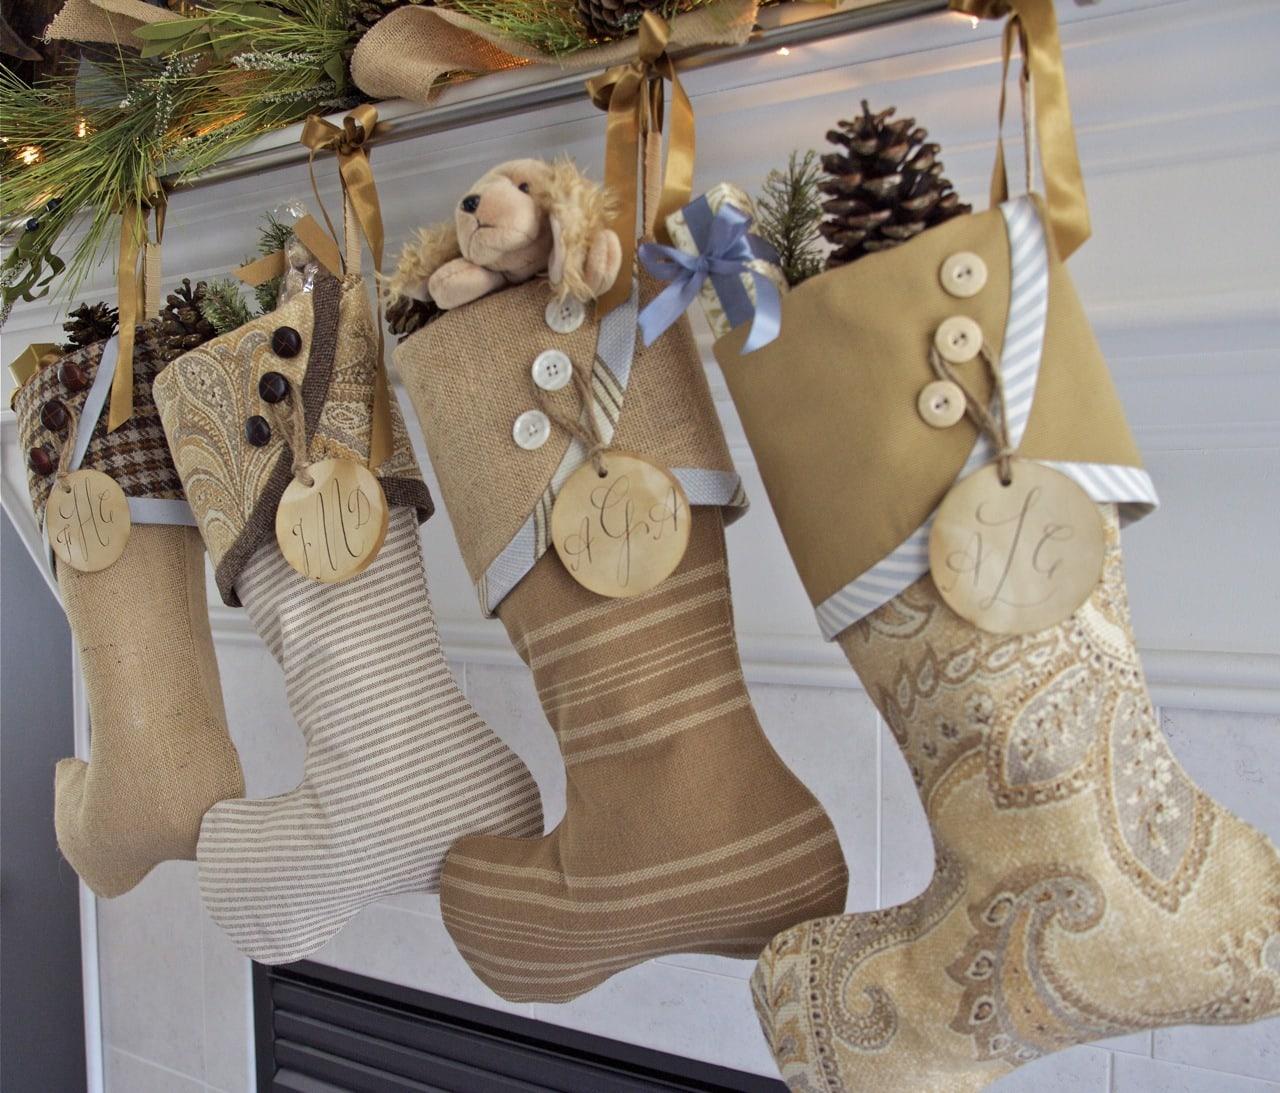 Burlap Christmas Stockings Part - 18: IMG_2265